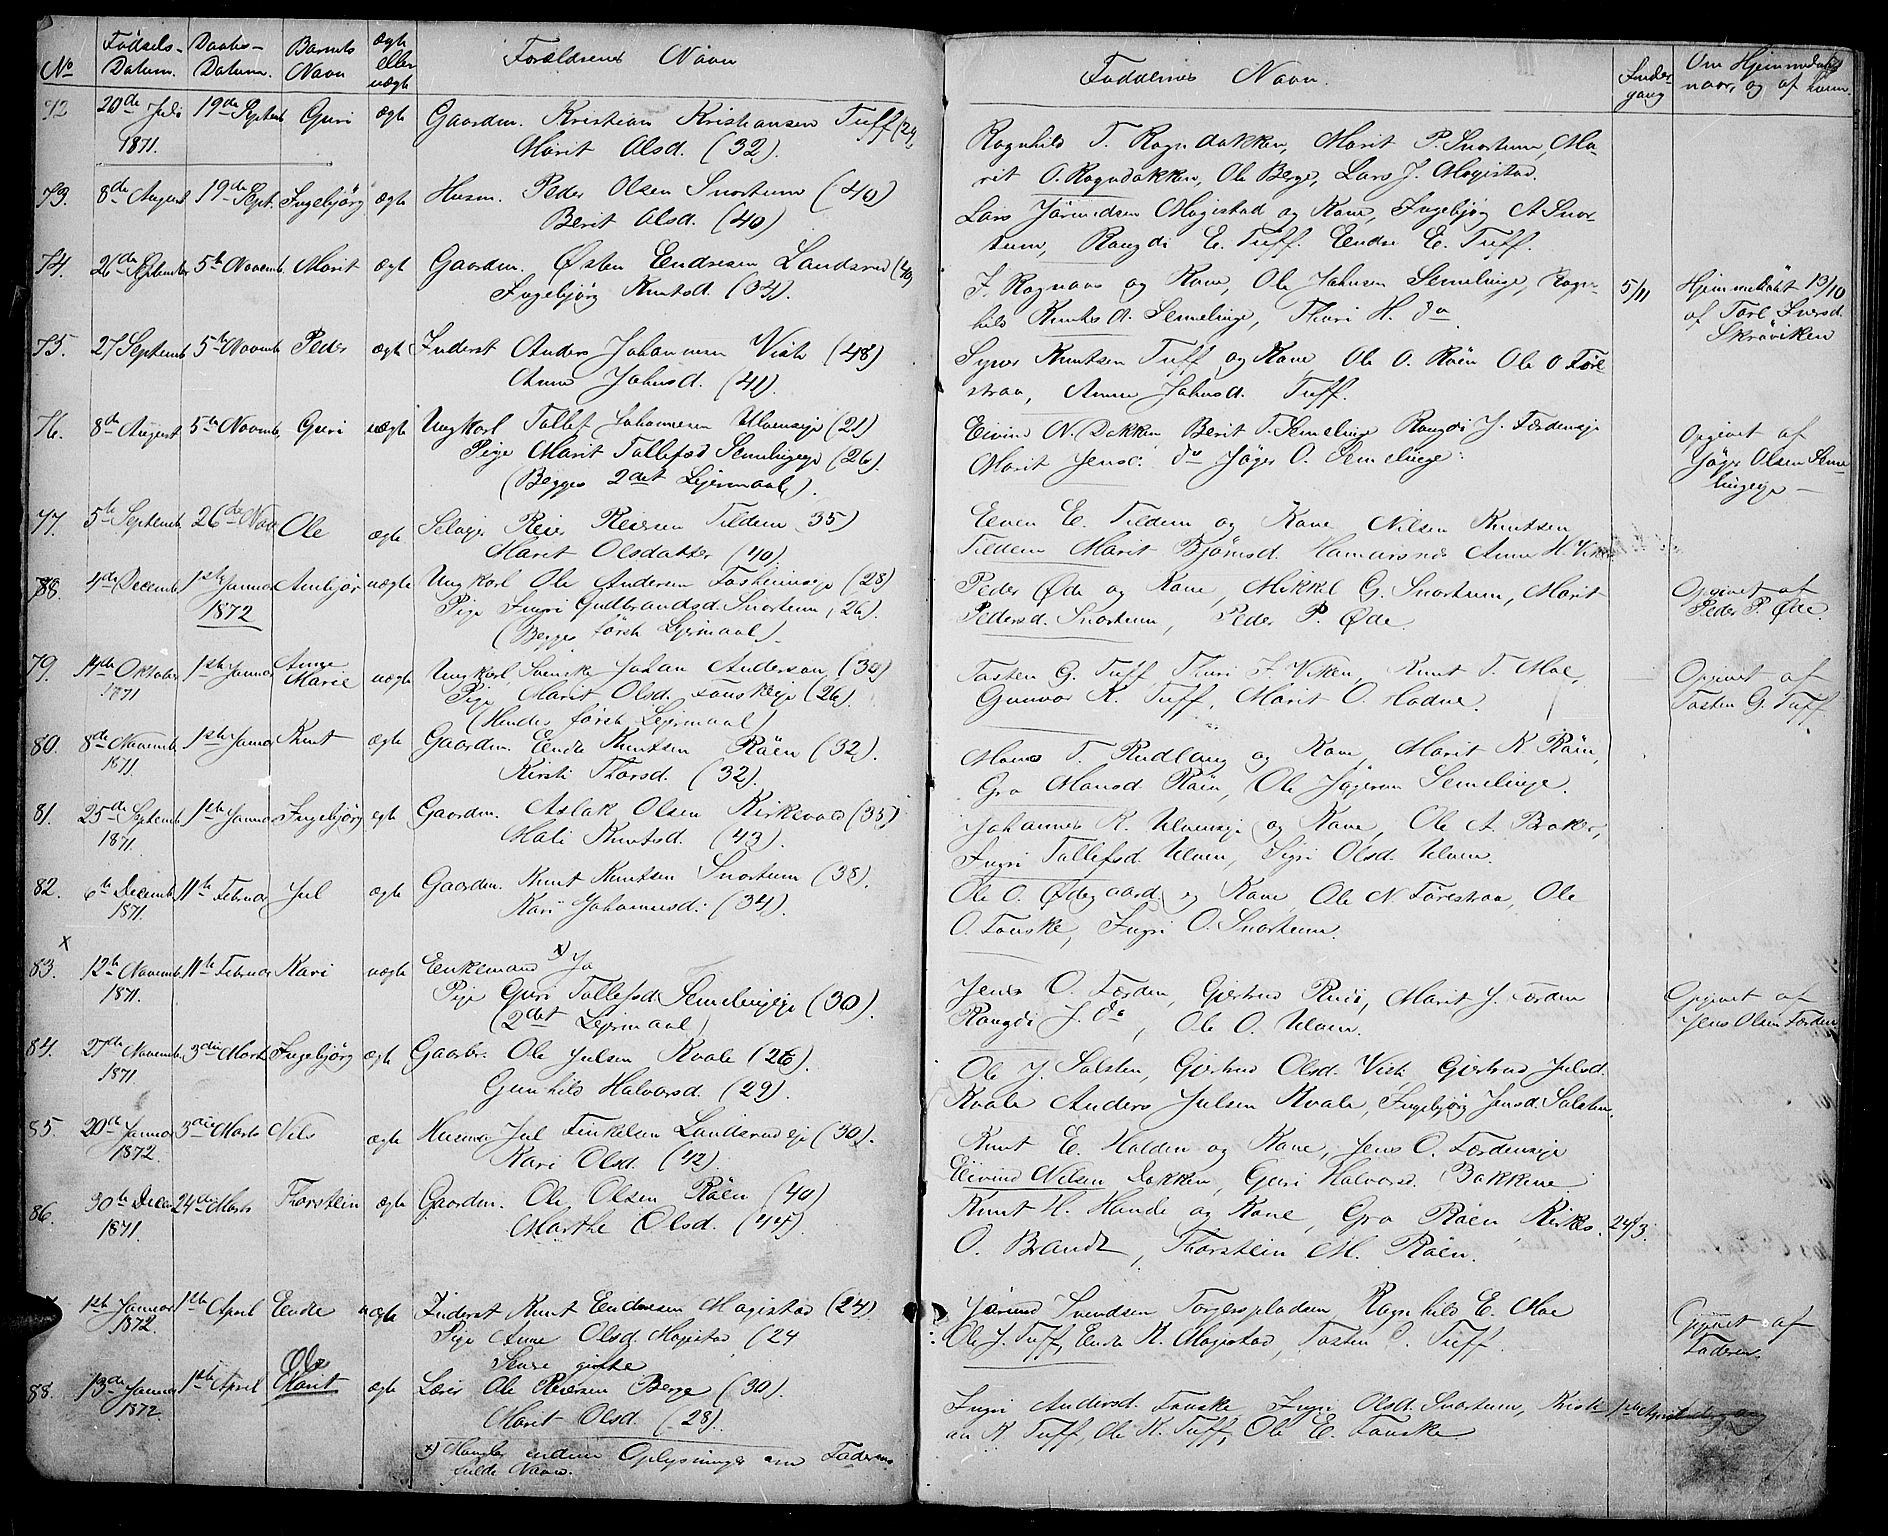 SAH, Vestre Slidre prestekontor, Klokkerbok nr. 3, 1869-1882, s. 7